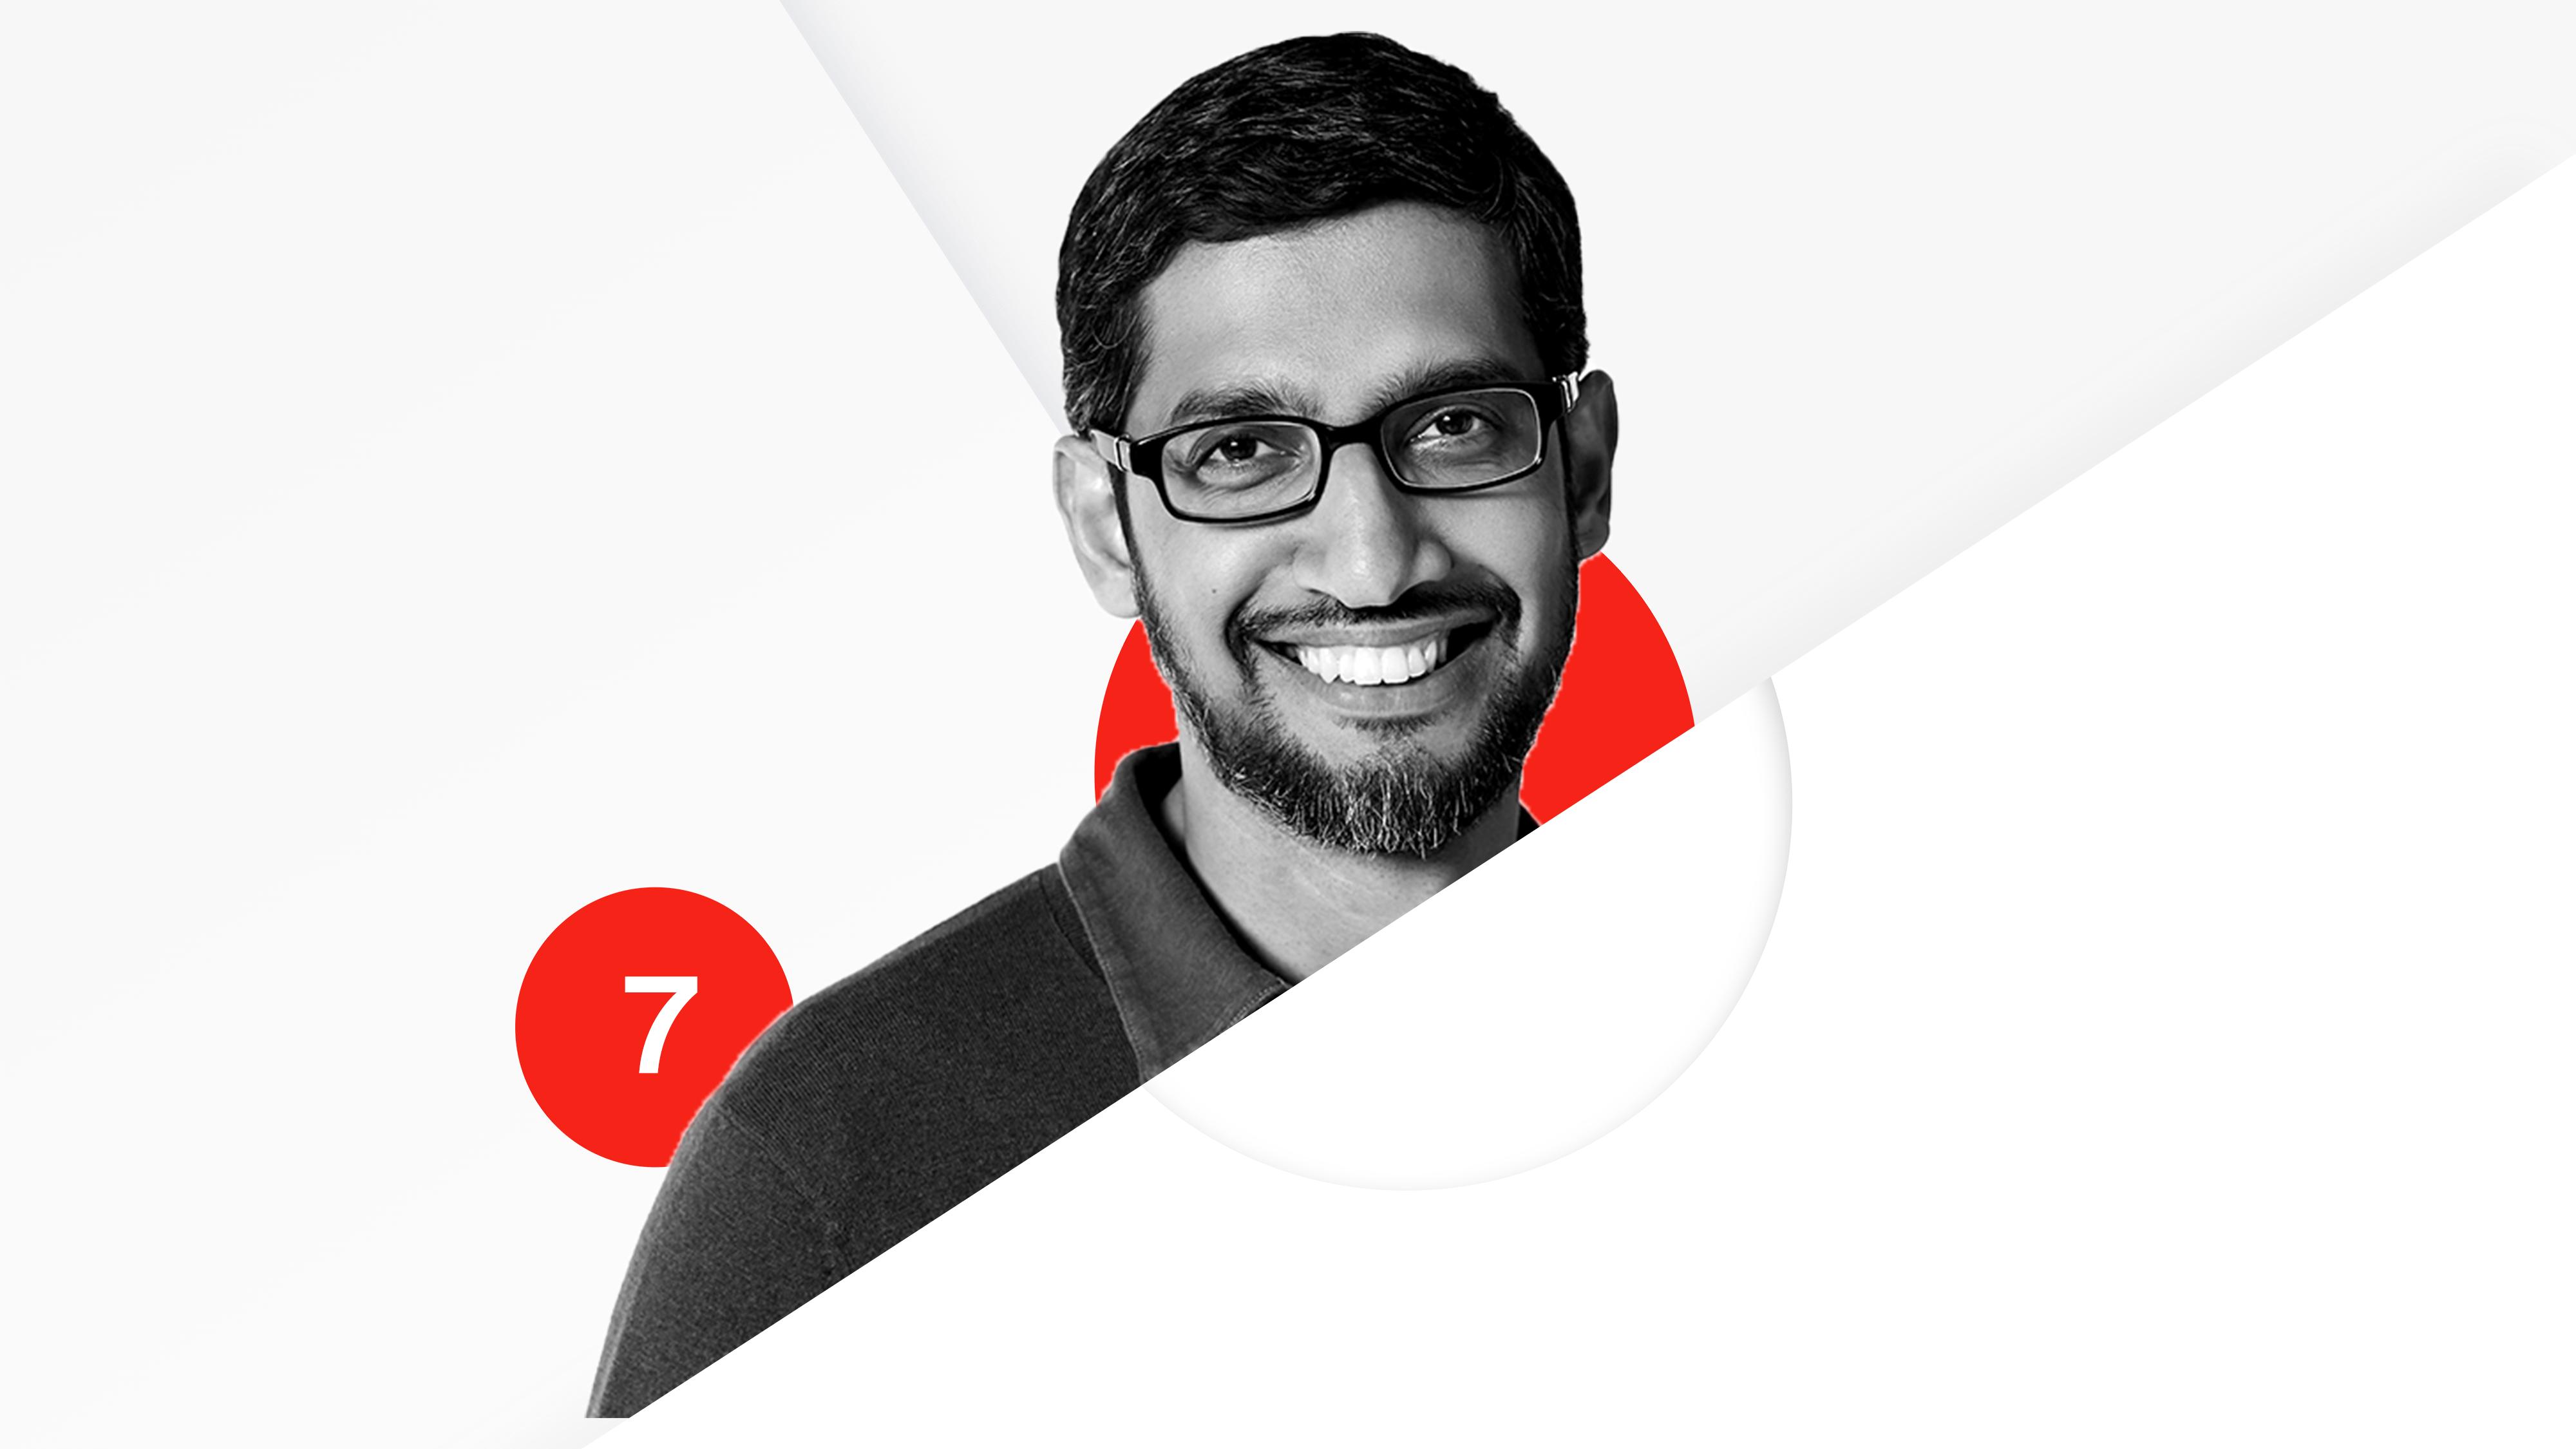 Microsoft's Sundar Pichai is No. 7 on the Recode 100.